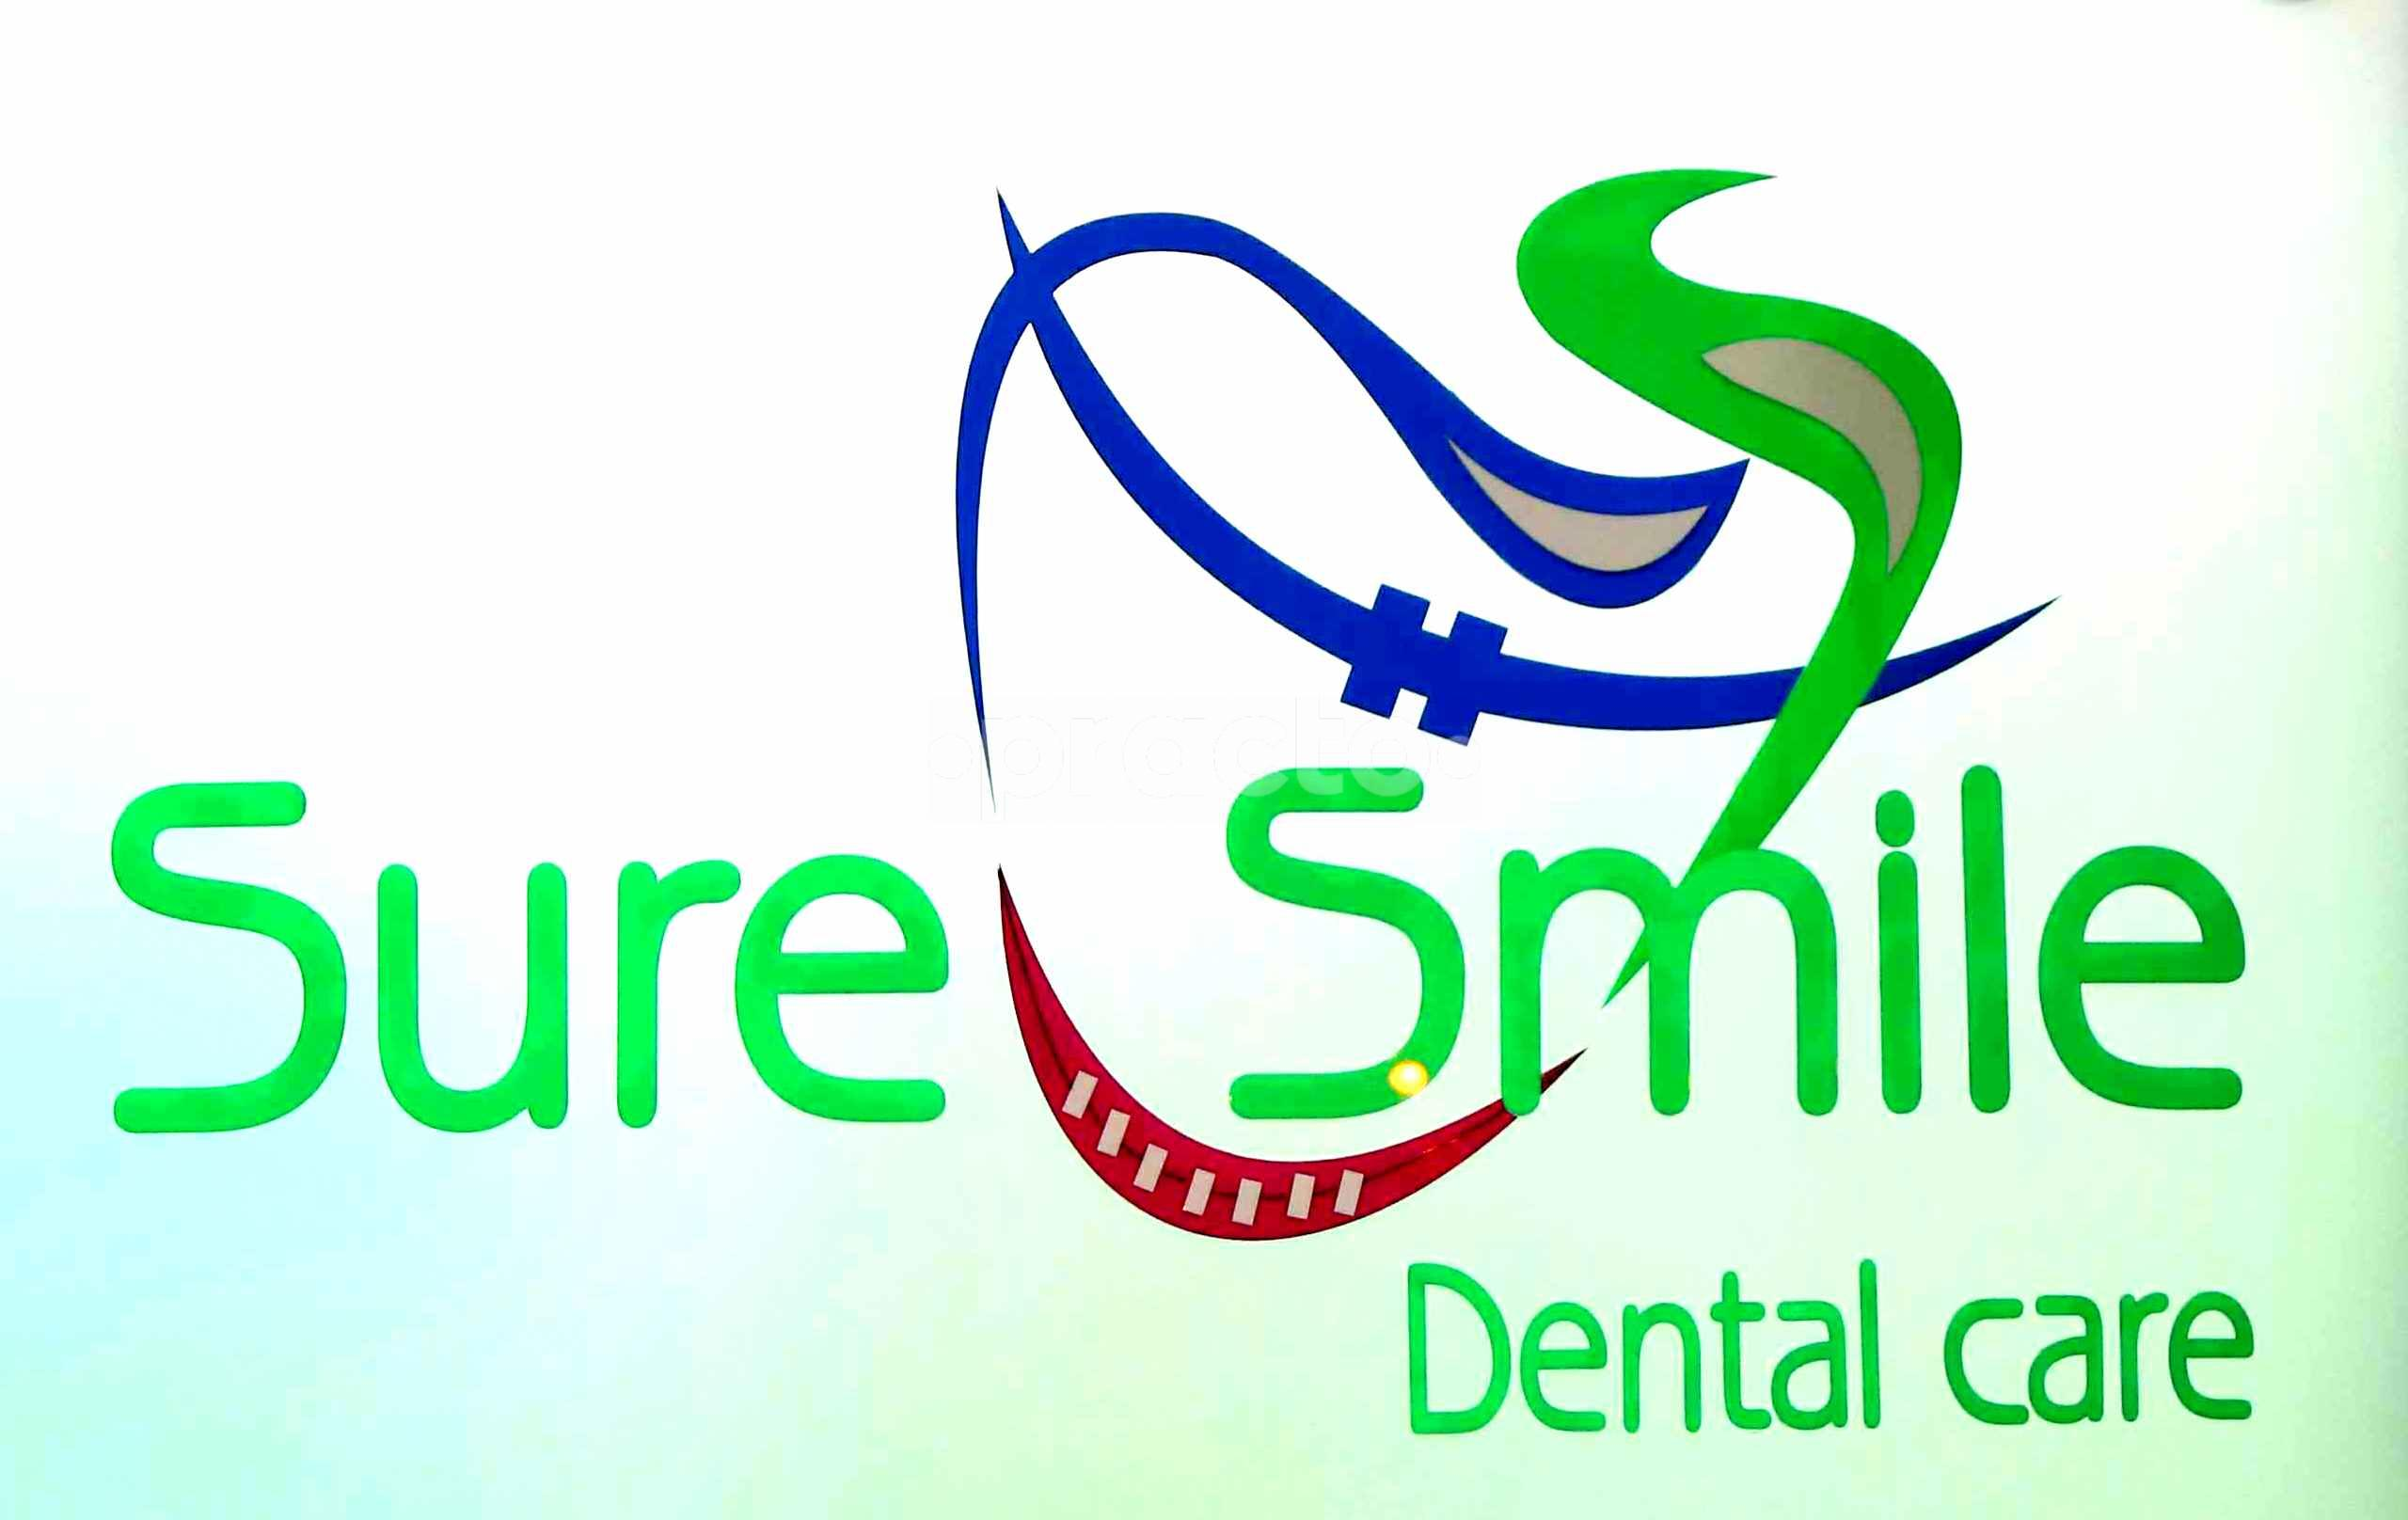 Sure Smile Dental Care